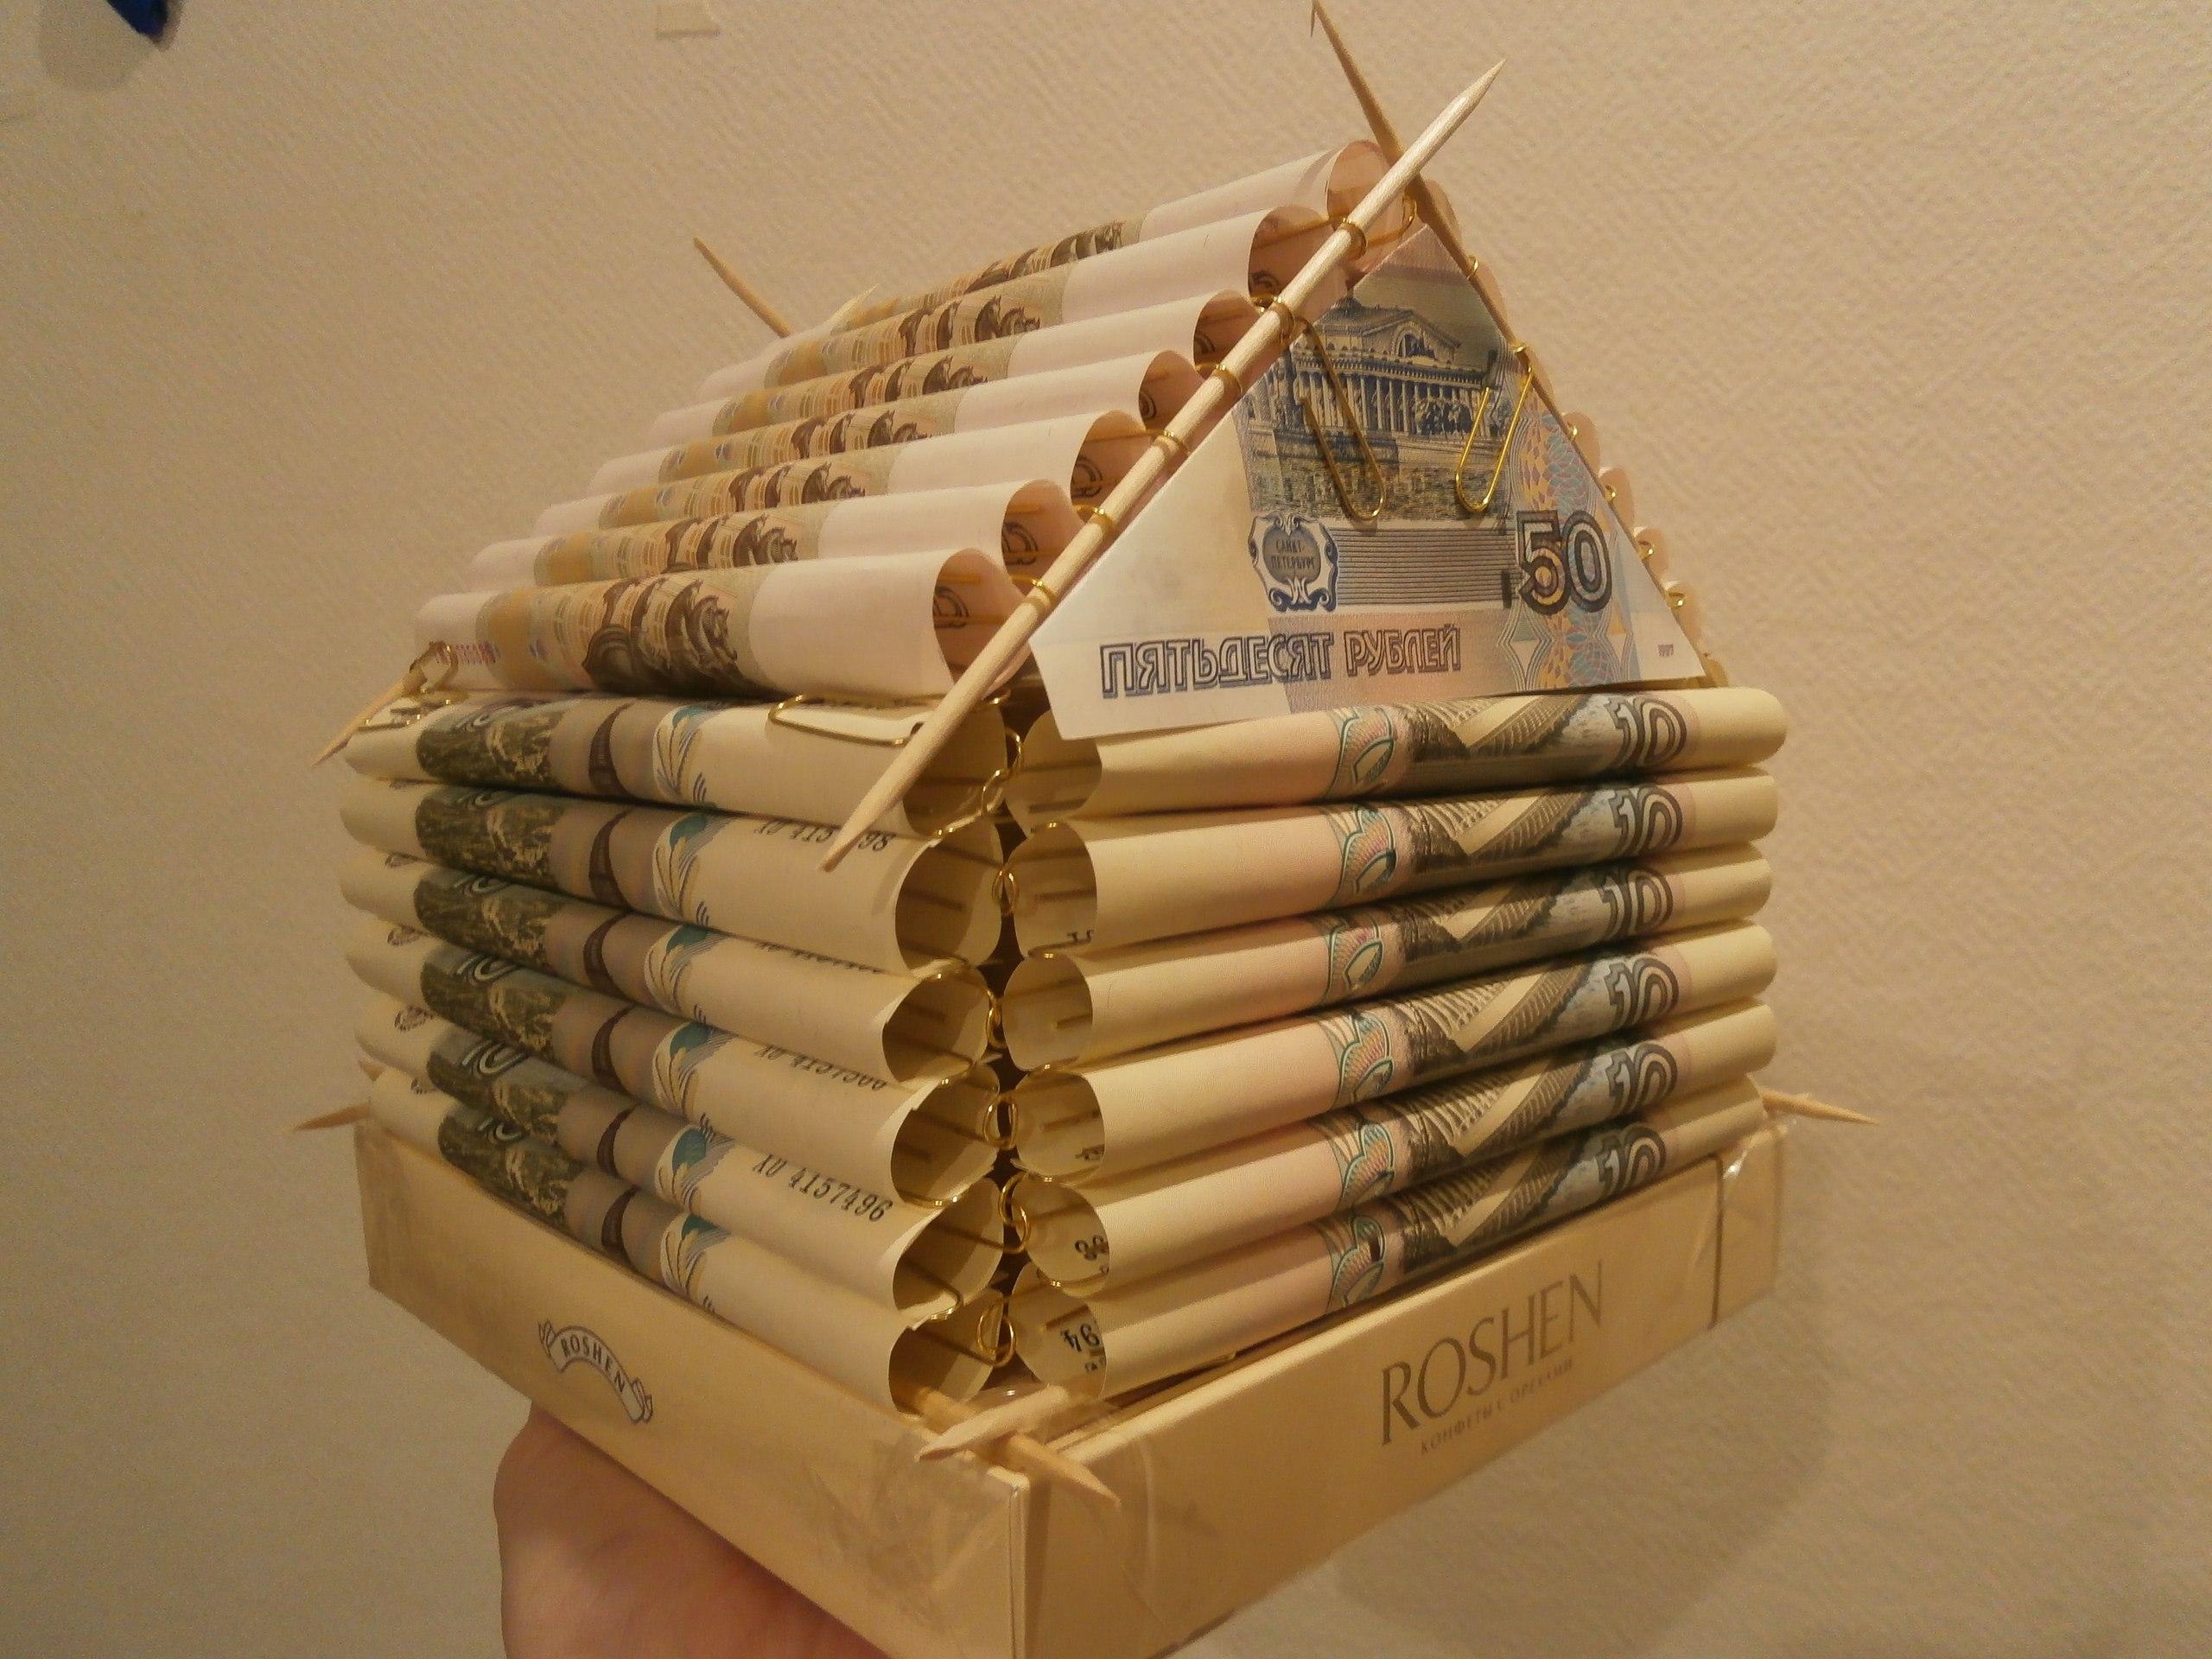 Прикольный подарок на свадьбу картинки, картинки коробка картинки